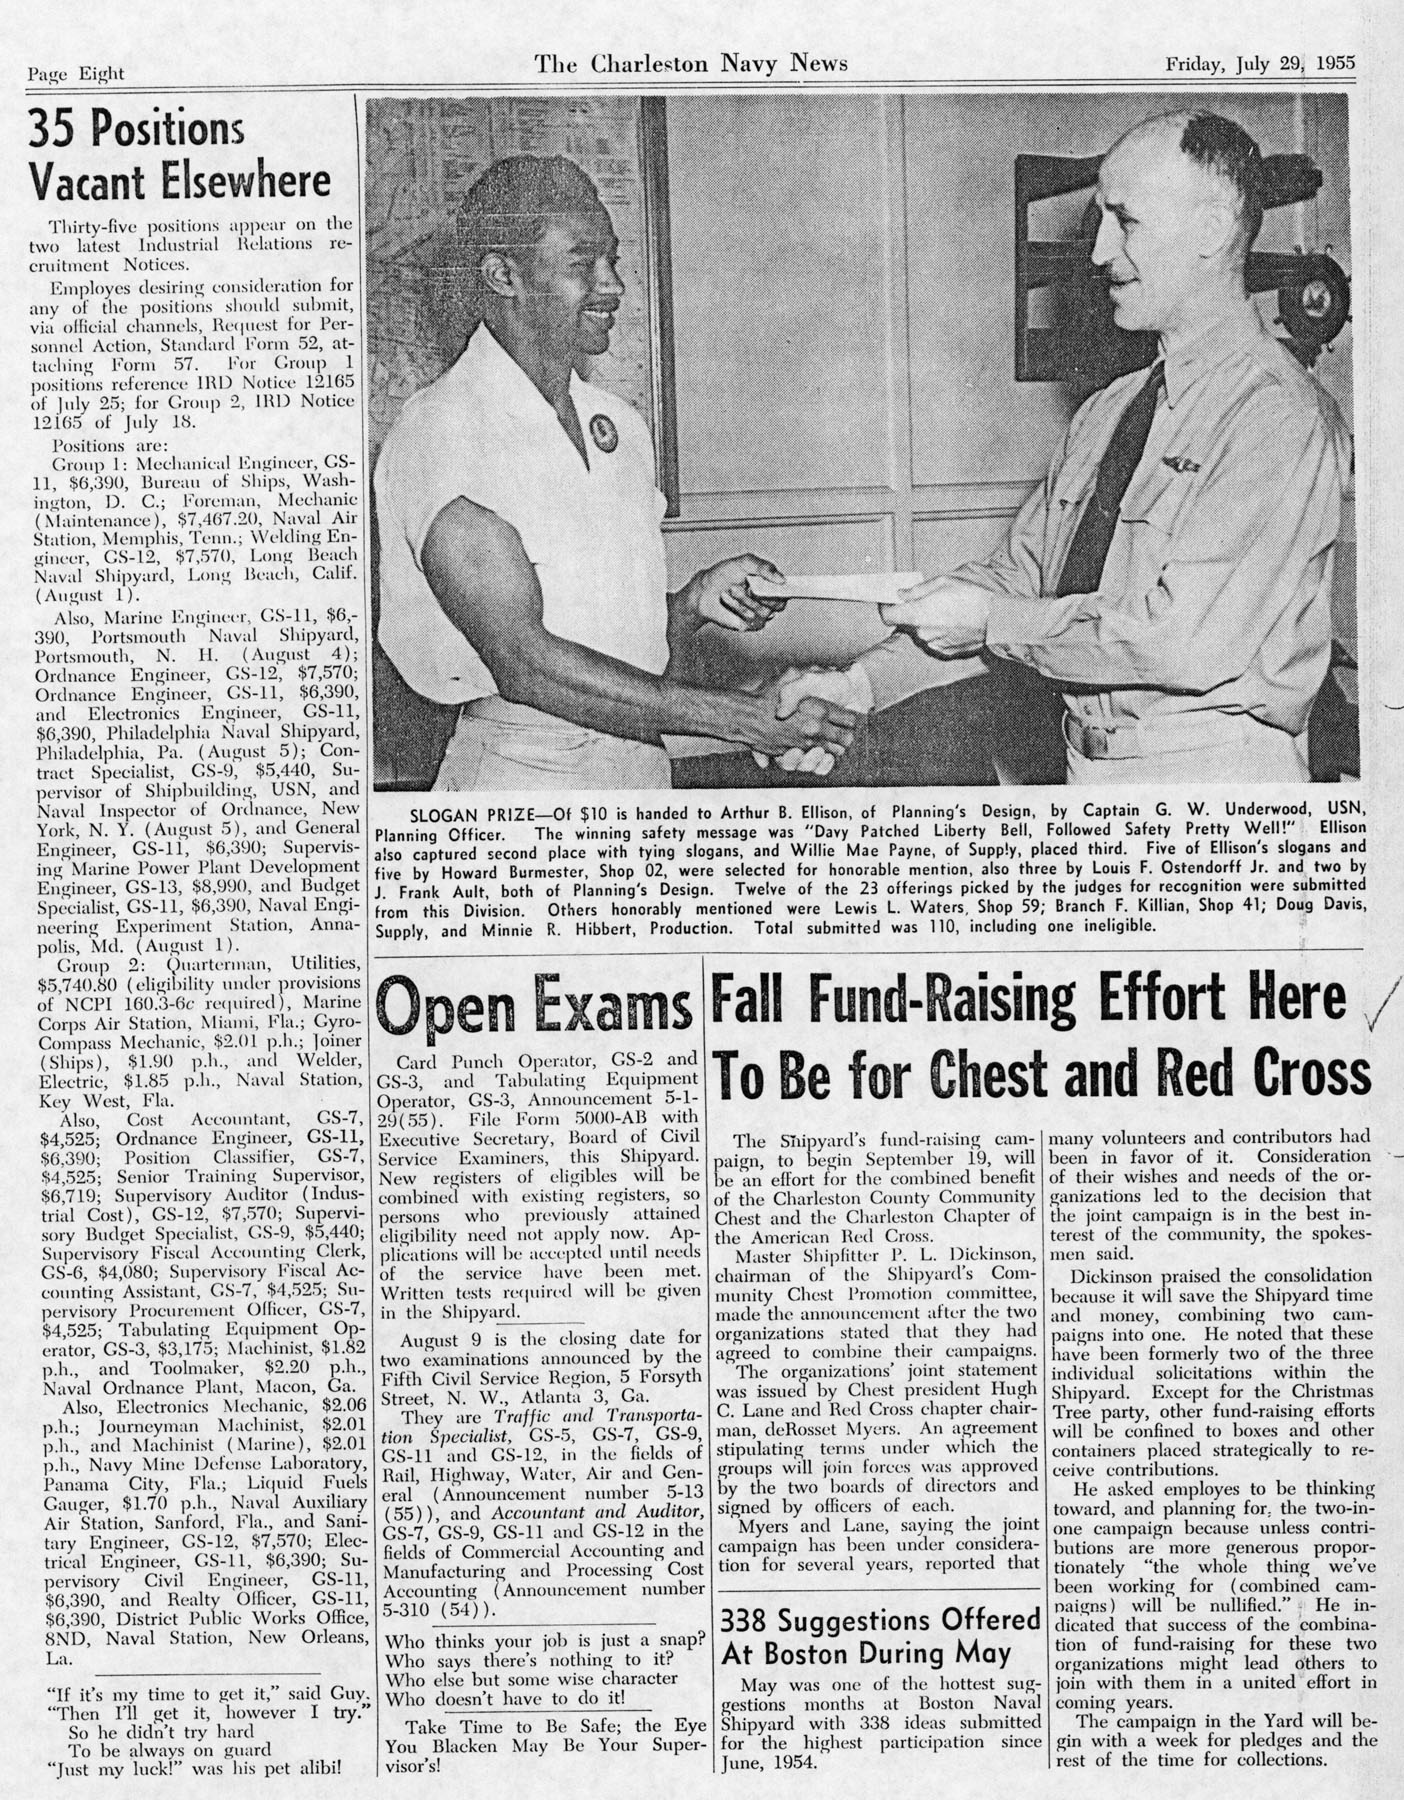 The Charleston Navy News, Volume 14, Edition 1, page viii